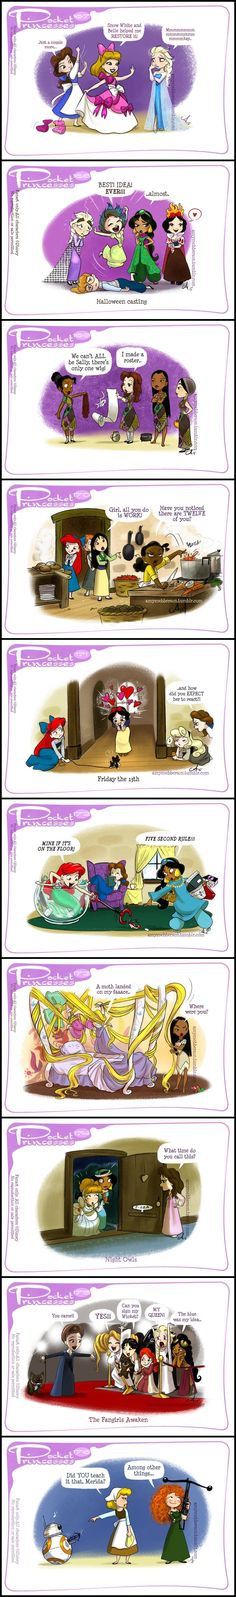 Pocket Princesses (Part 17) by Amy Mebberson